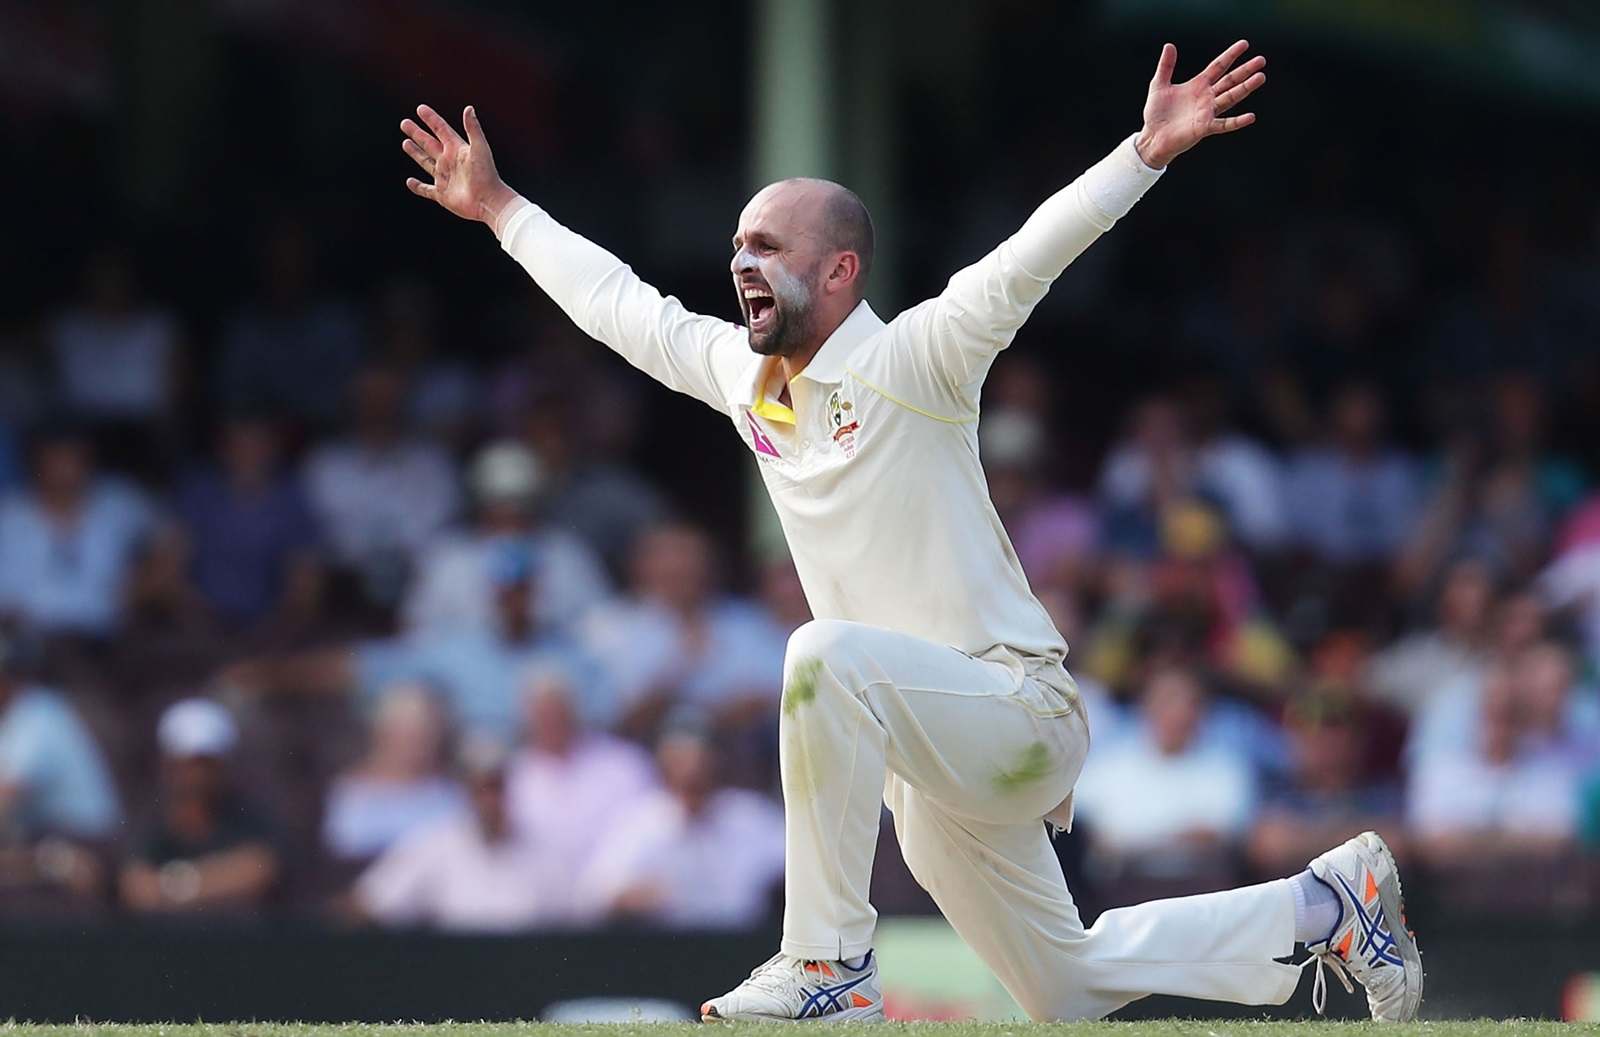 Milestone wickets special for Lyon | cricket.com.au